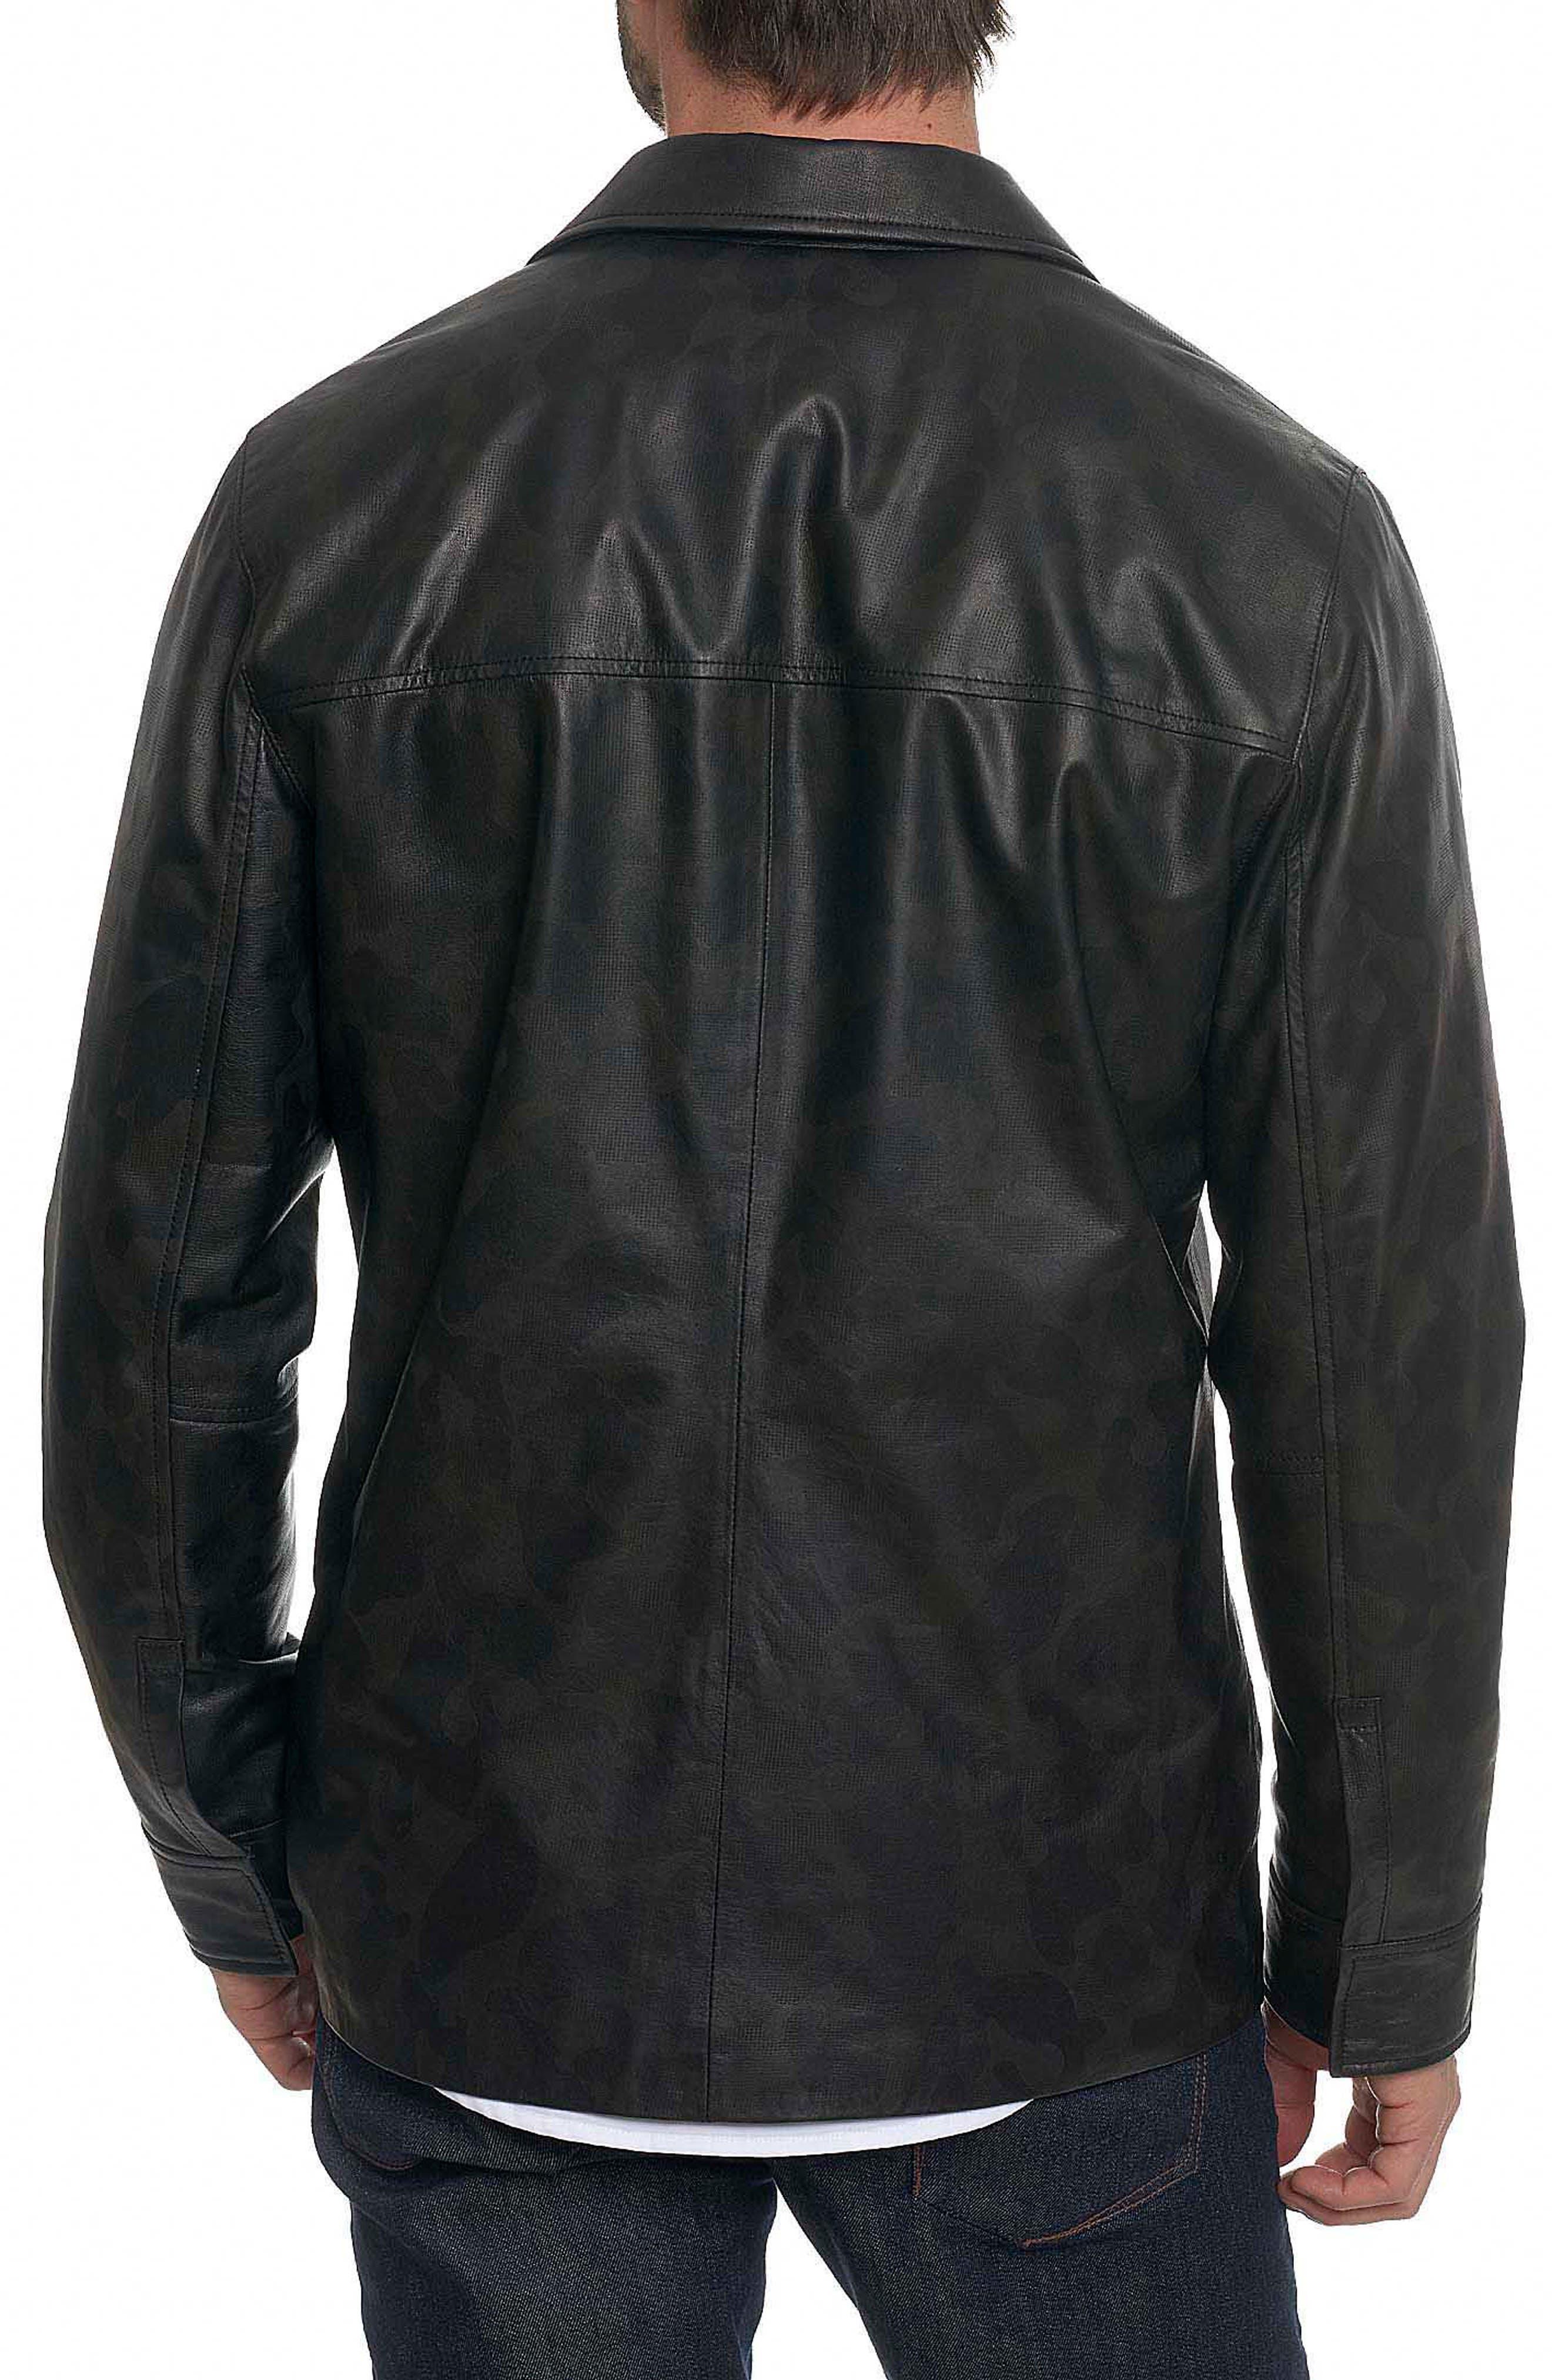 Colden Camo Leather Shirt Jacket,                             Alternate thumbnail 2, color,                             Black